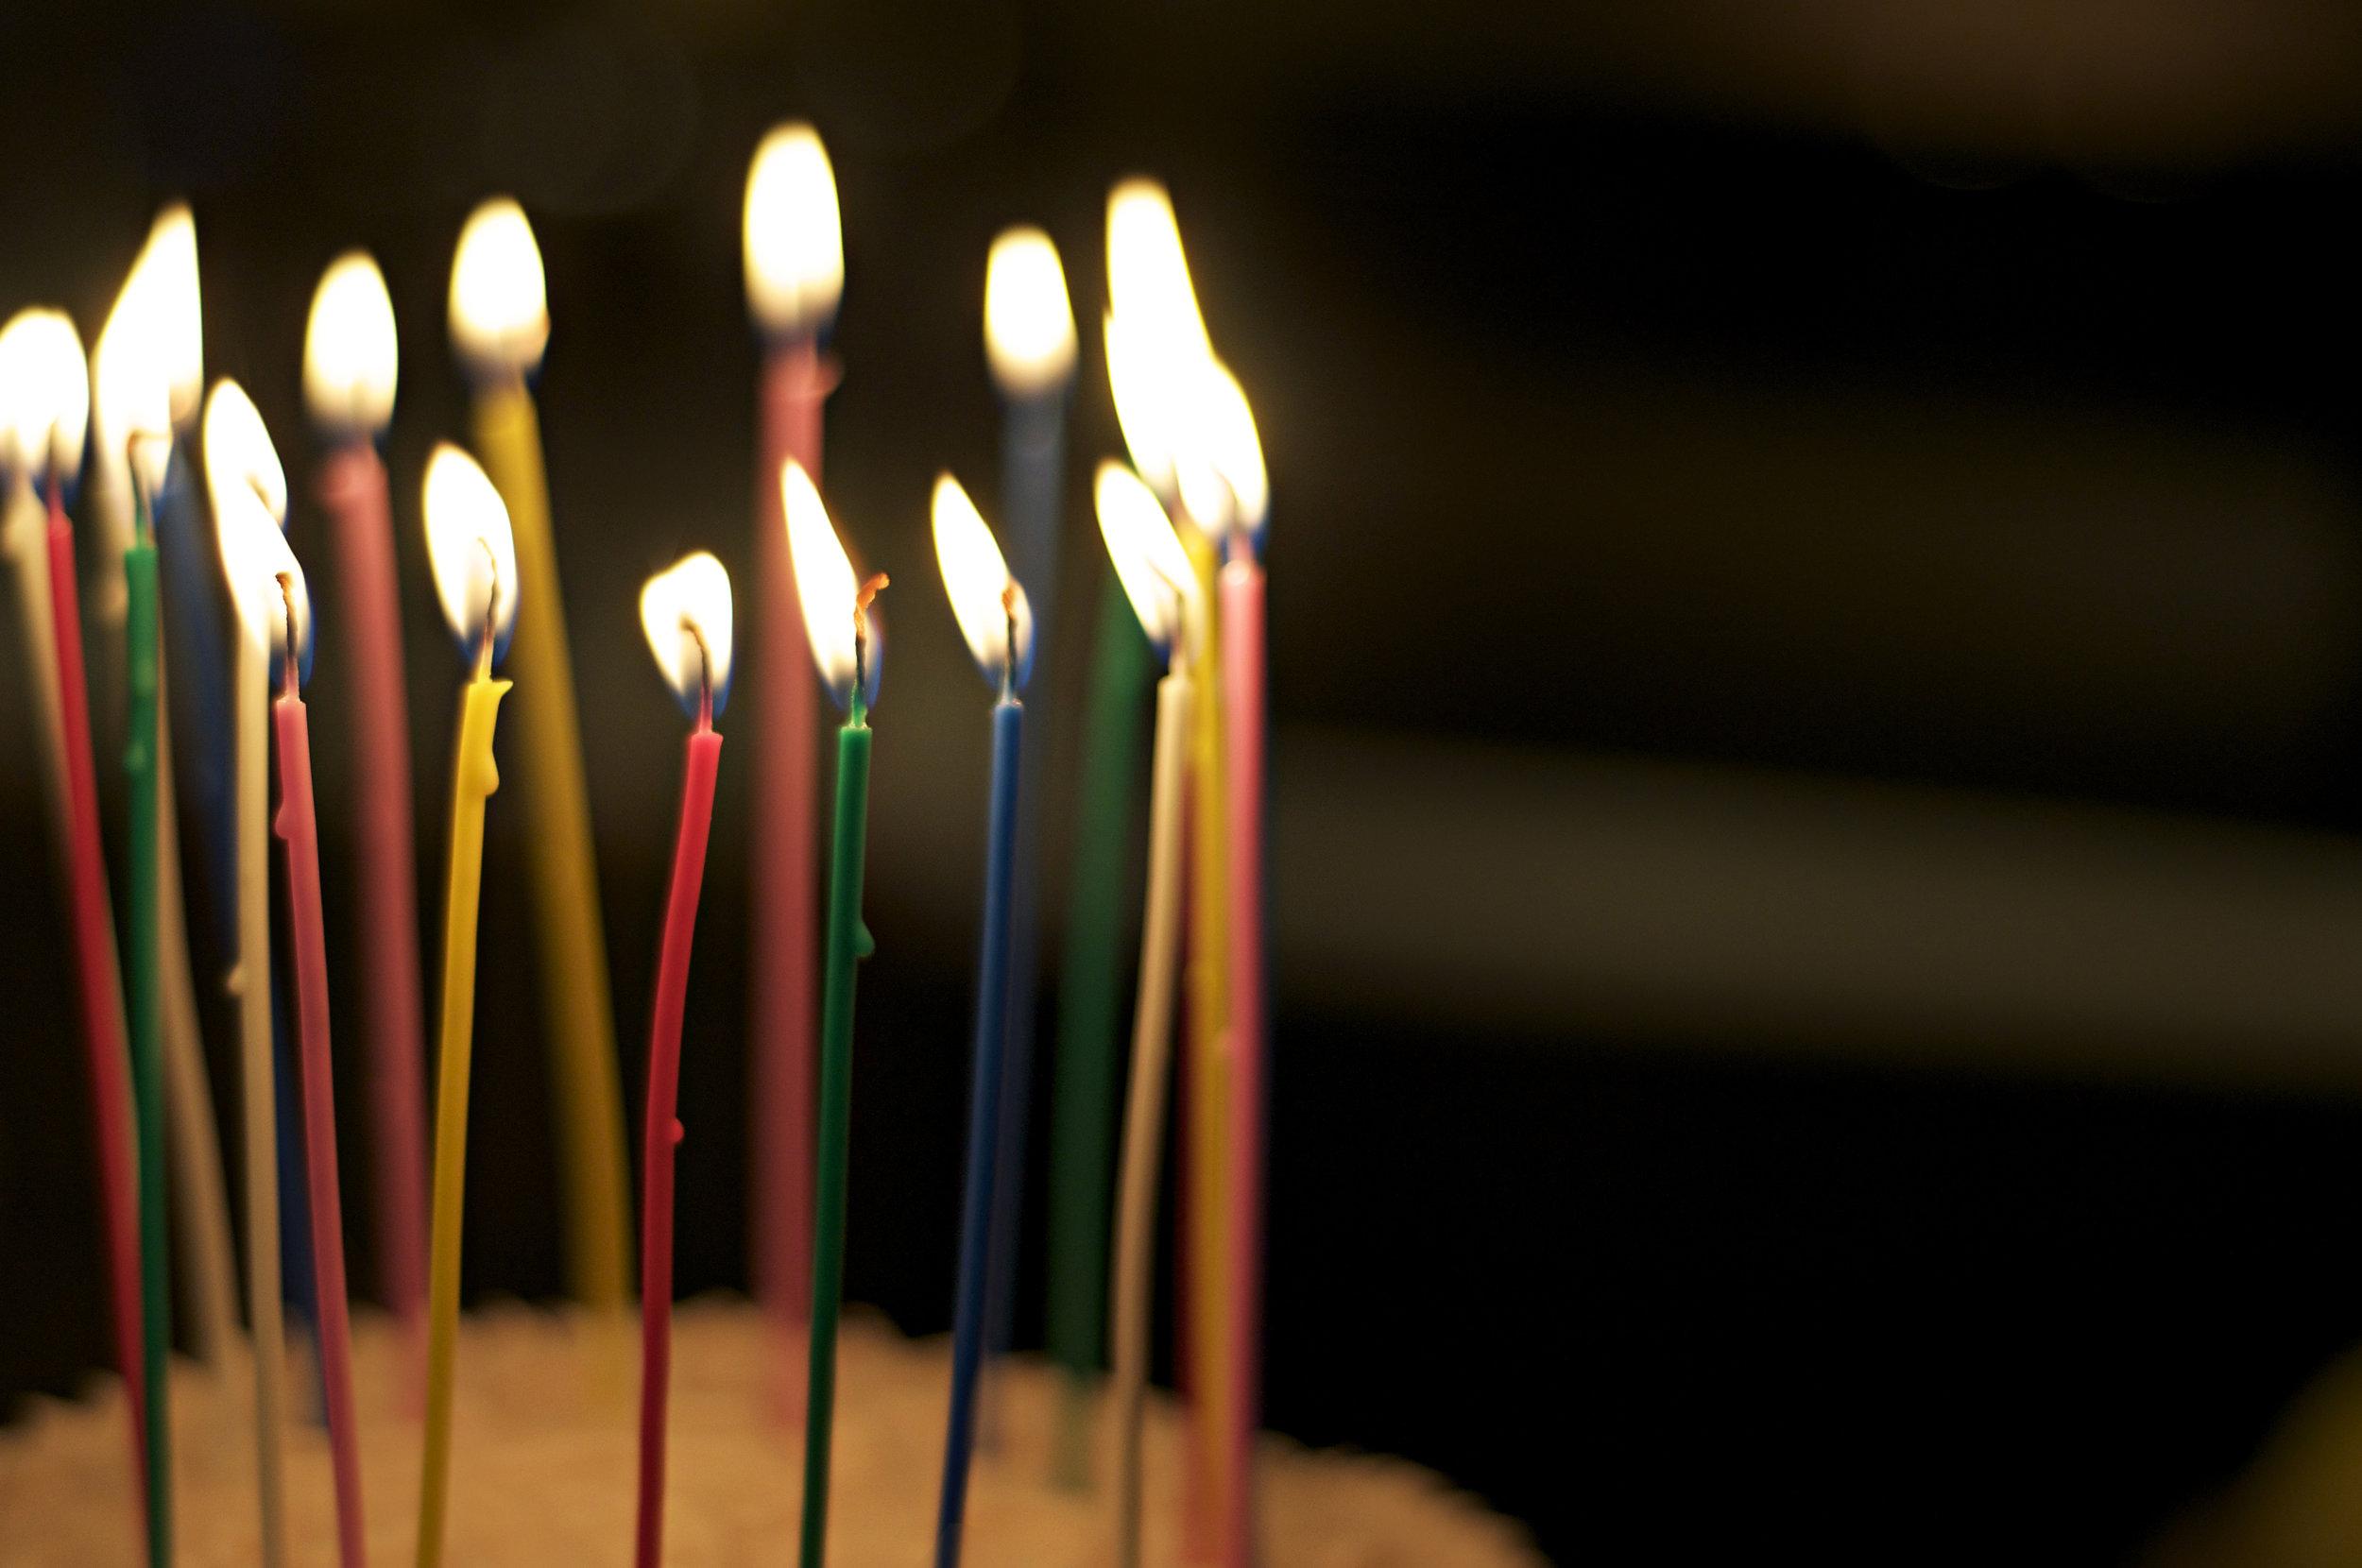 birthdaycandles.jpg